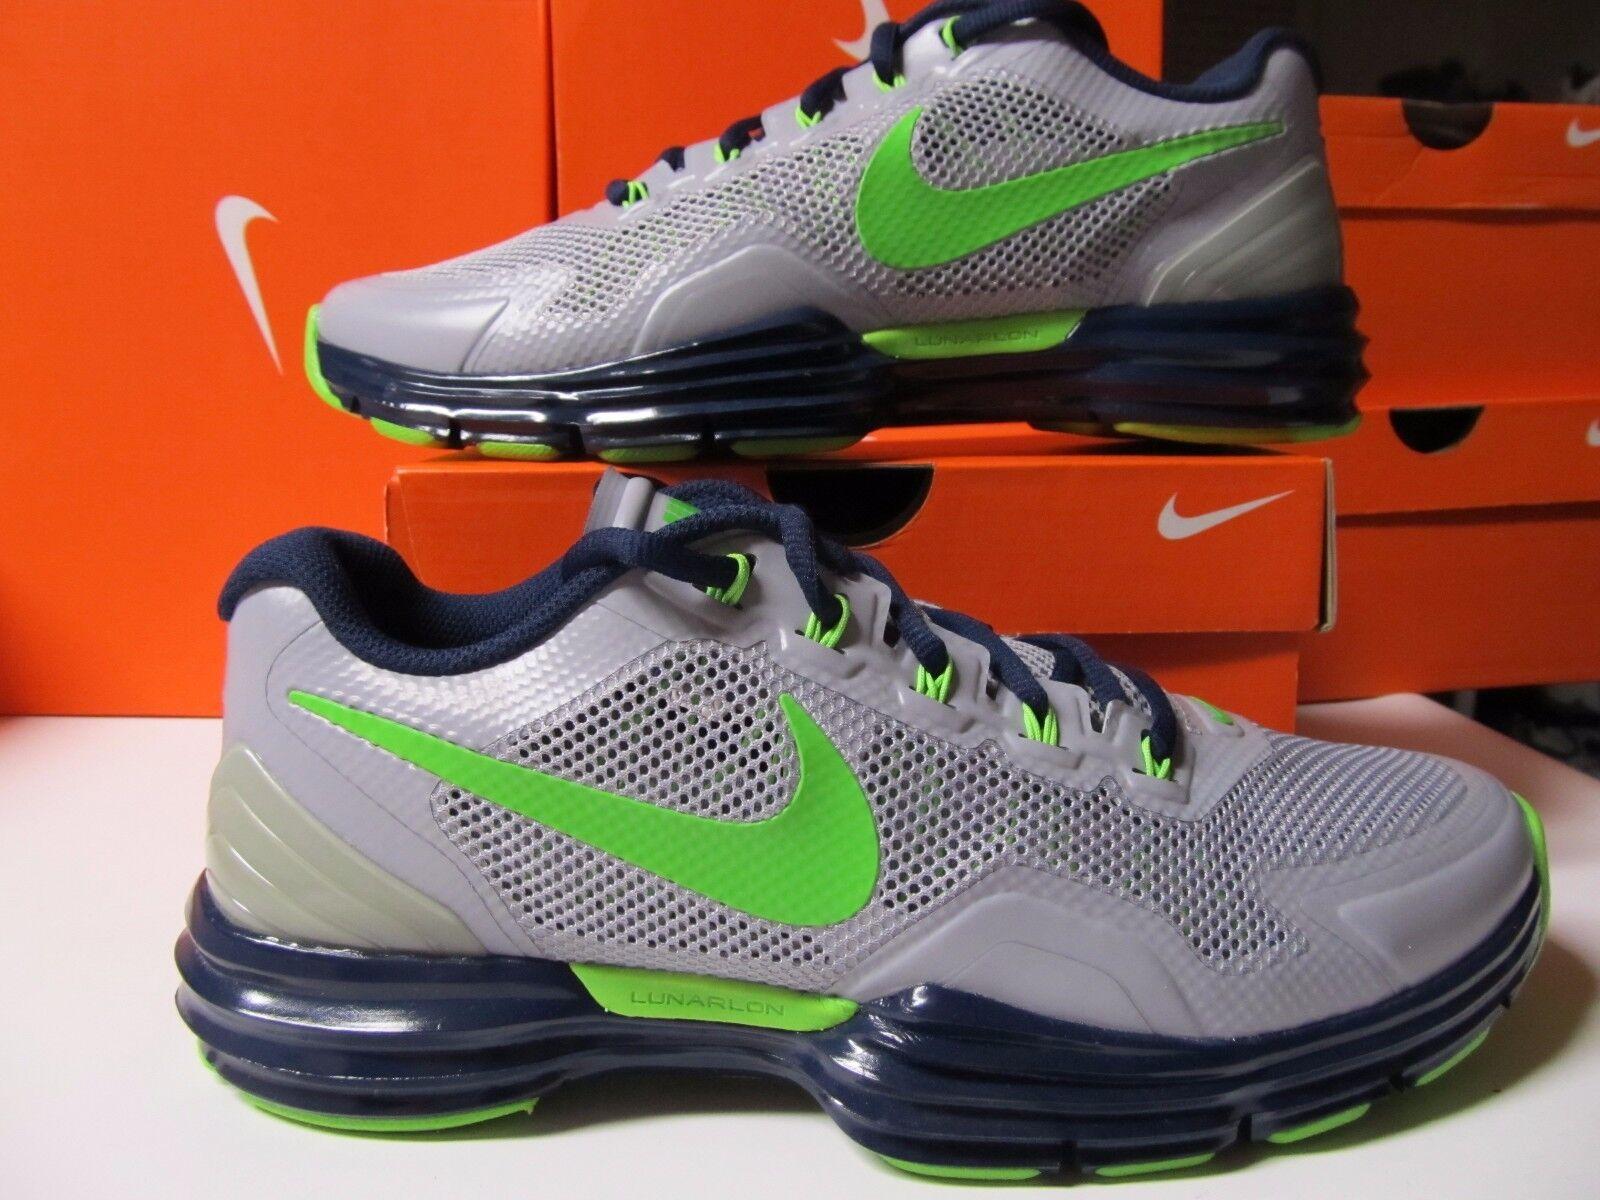 DS Nike Lunar TR1 PF SEATTLE SEAHAWKS Wolf Grey Green bluee 543594 029 NFL 90 amp